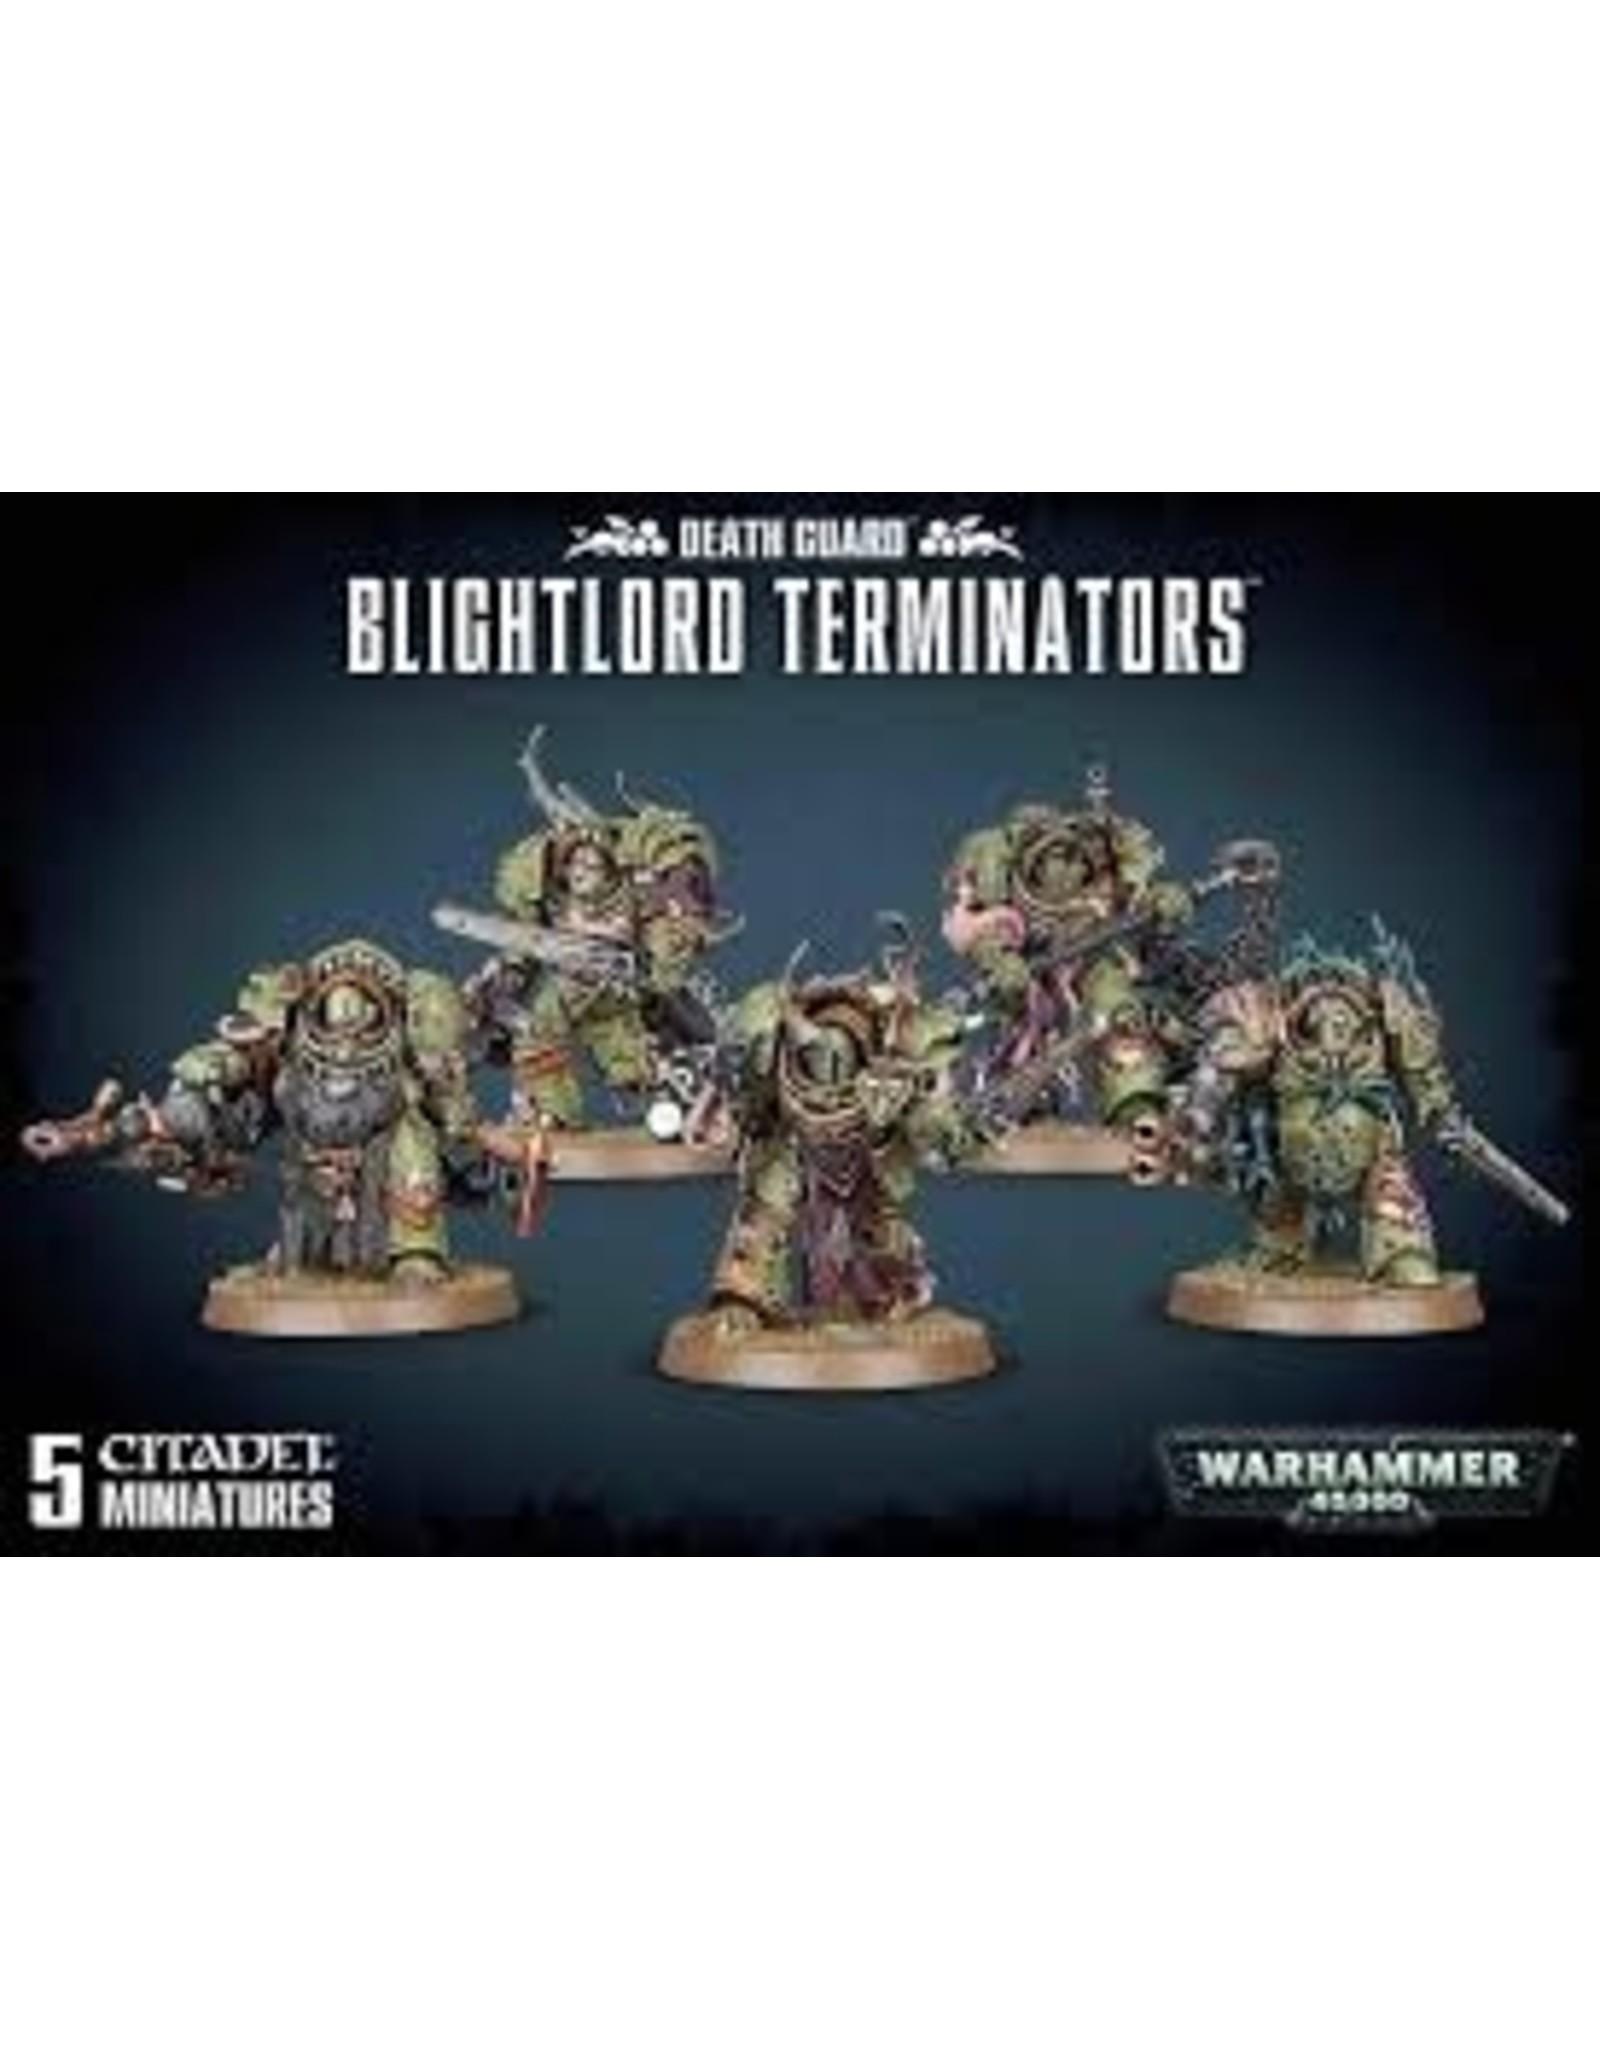 Warhammer 40K Chaos Death Guard: Blightlord Terminators